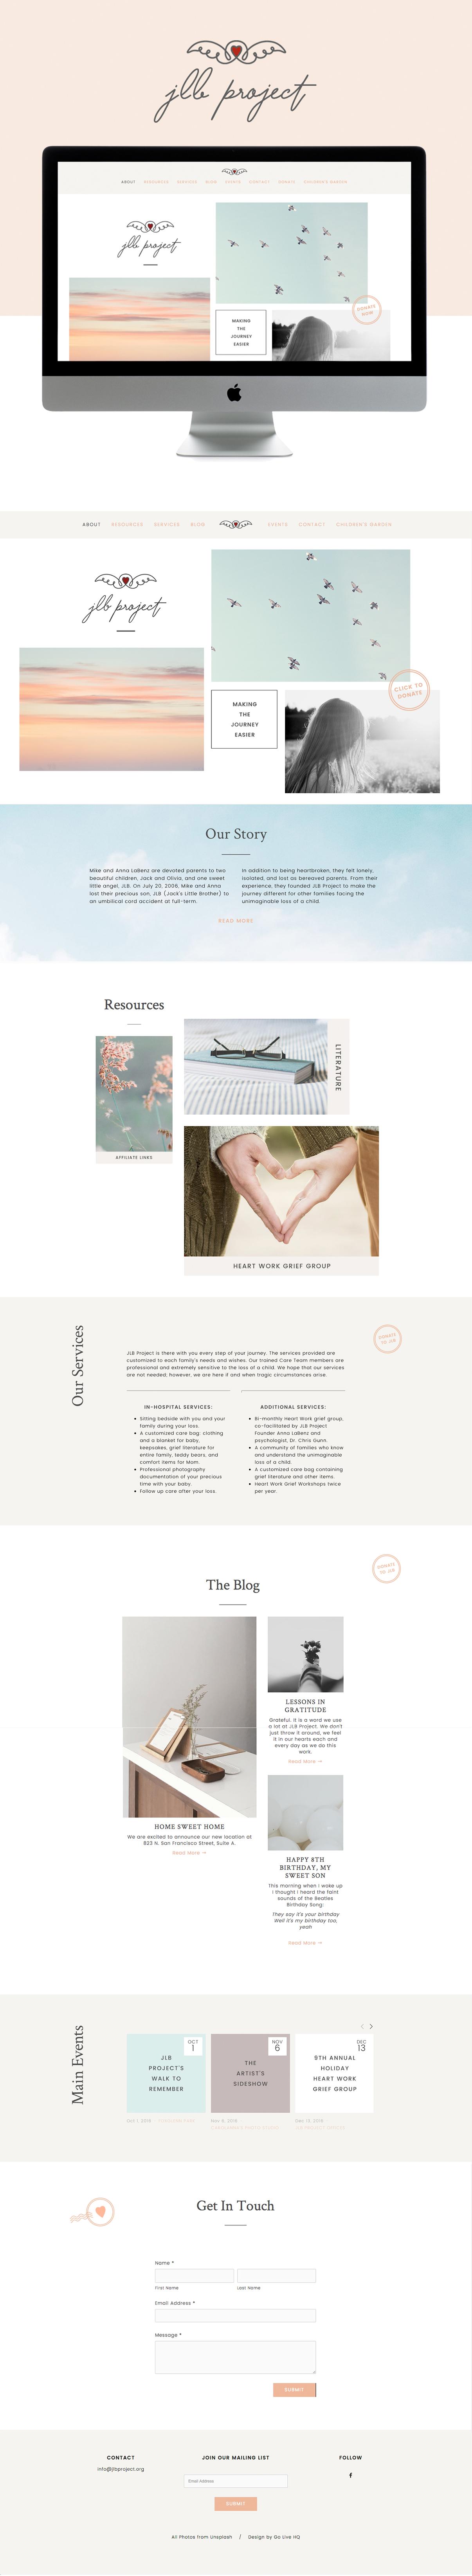 Calm, hopeful and warm Squarespace website design | designed by: golivehq.co